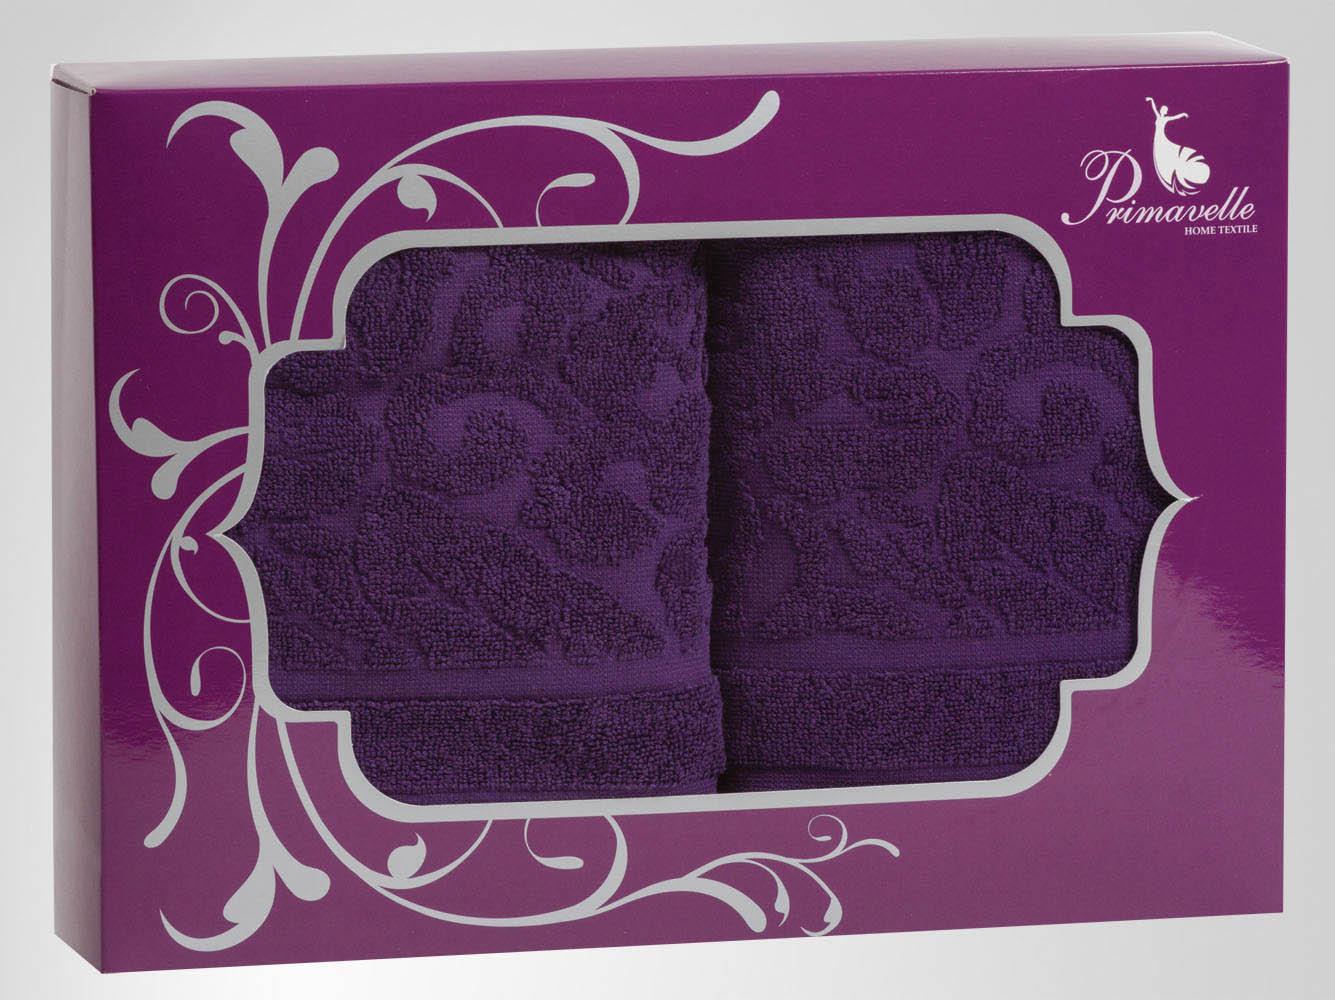 Полотенца Primavelle Полотенце Fiona Цвет: Фиолетовый (50х90 см - 2 шт) цена и фото